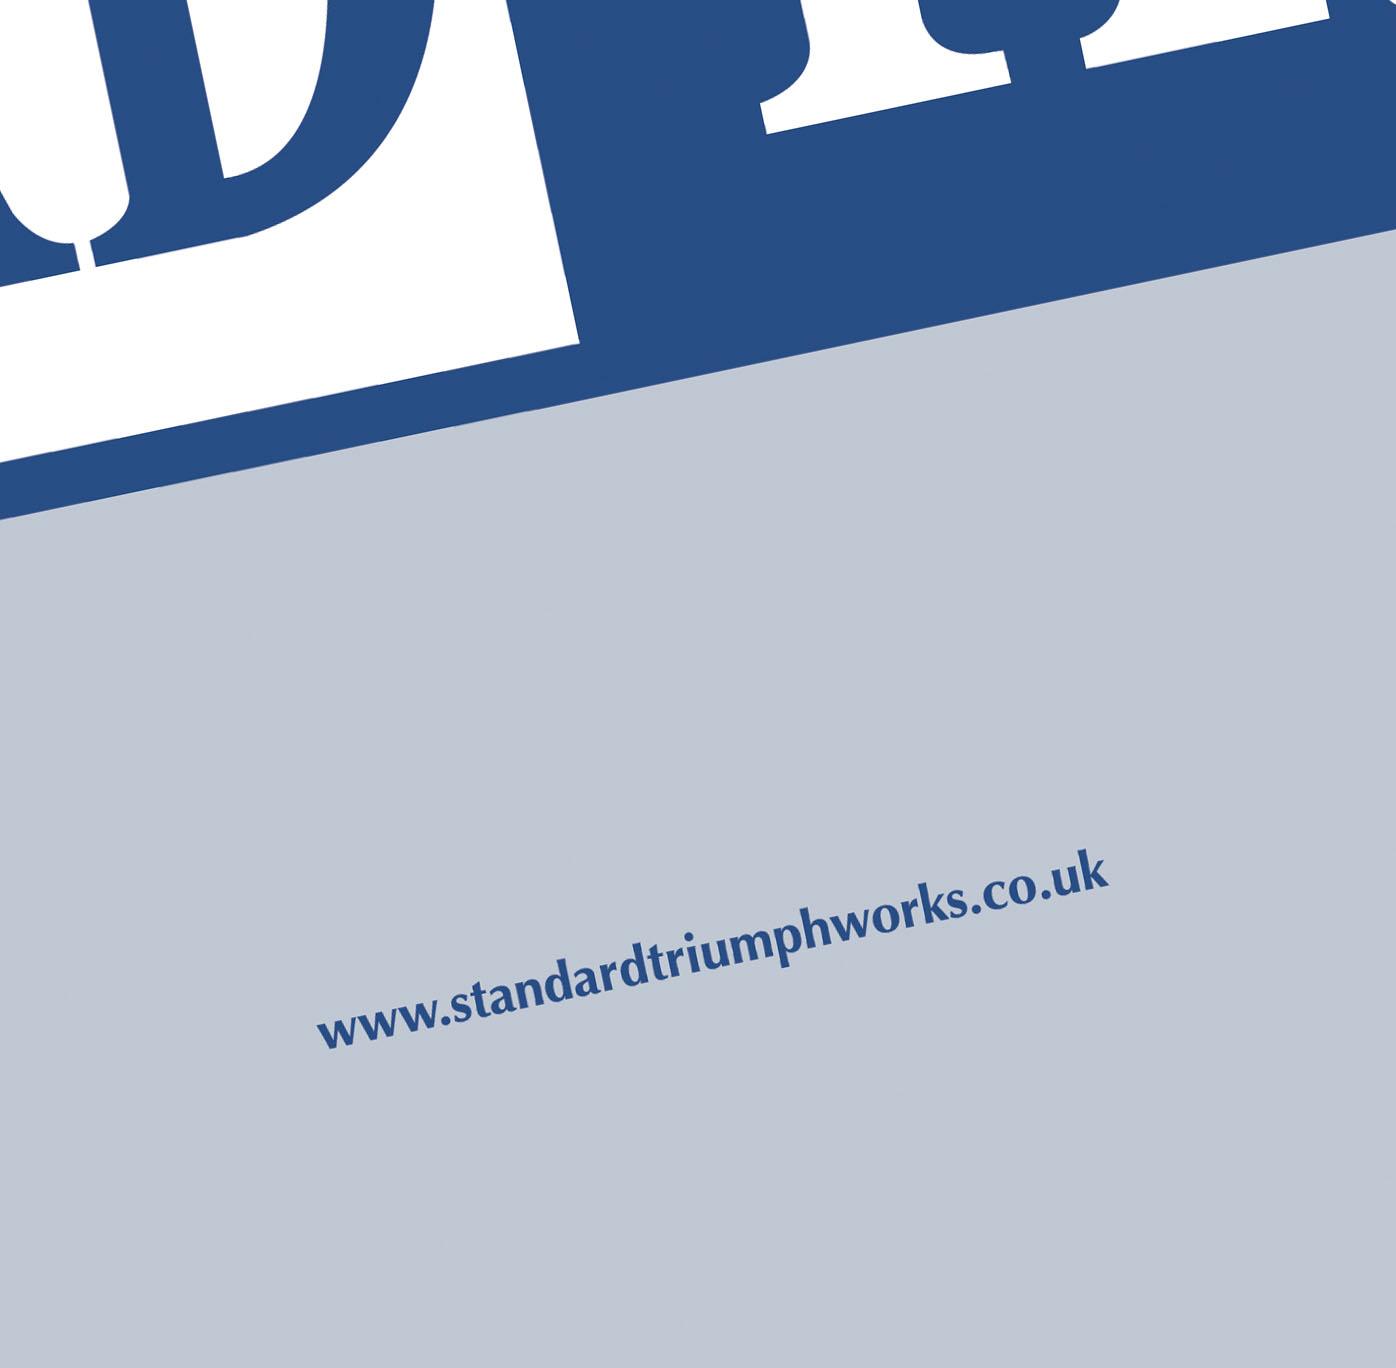 standard triumph sign